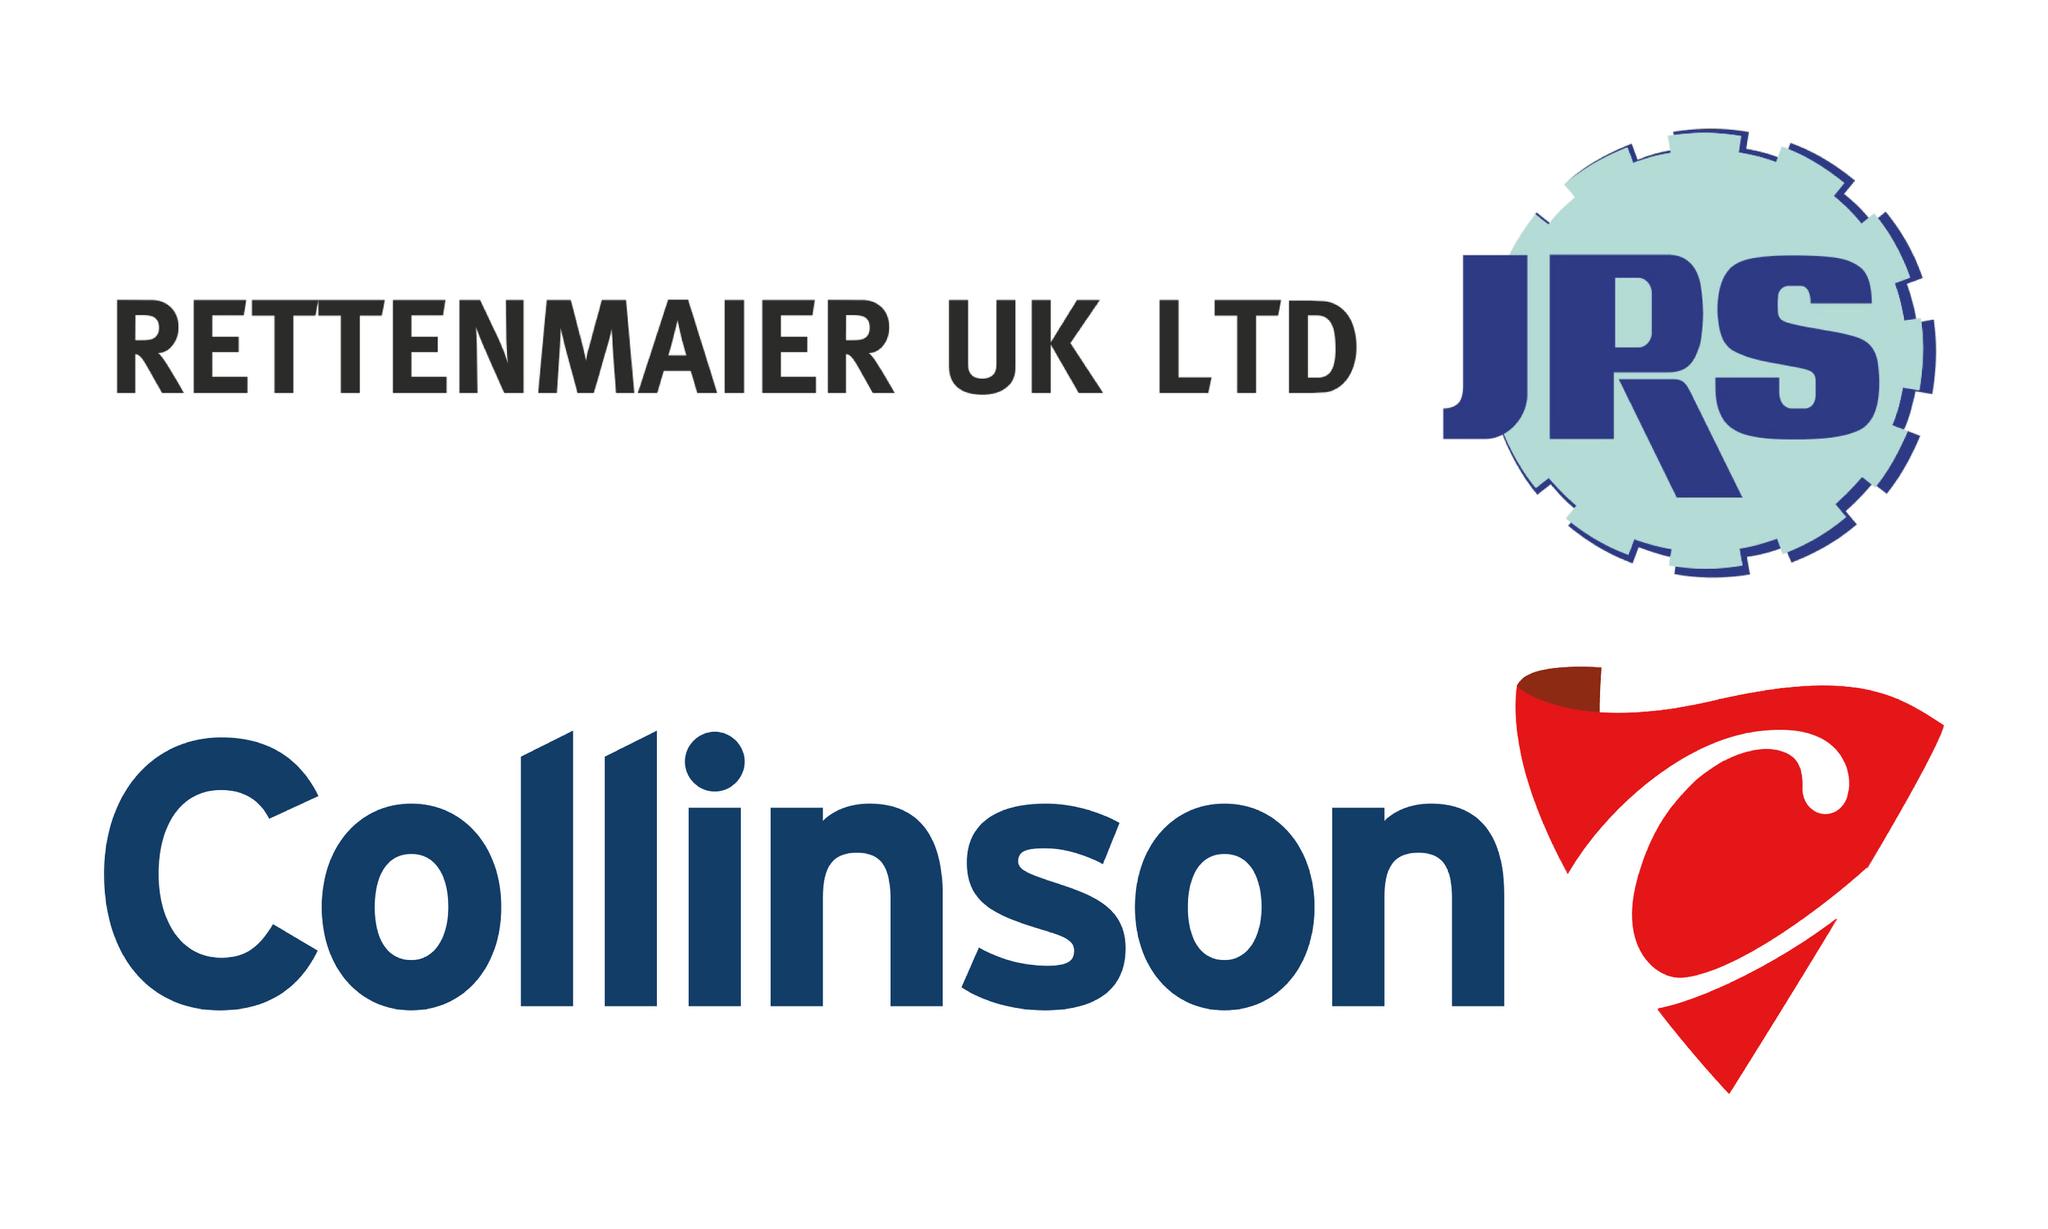 Collinson & Rettenmaier UK